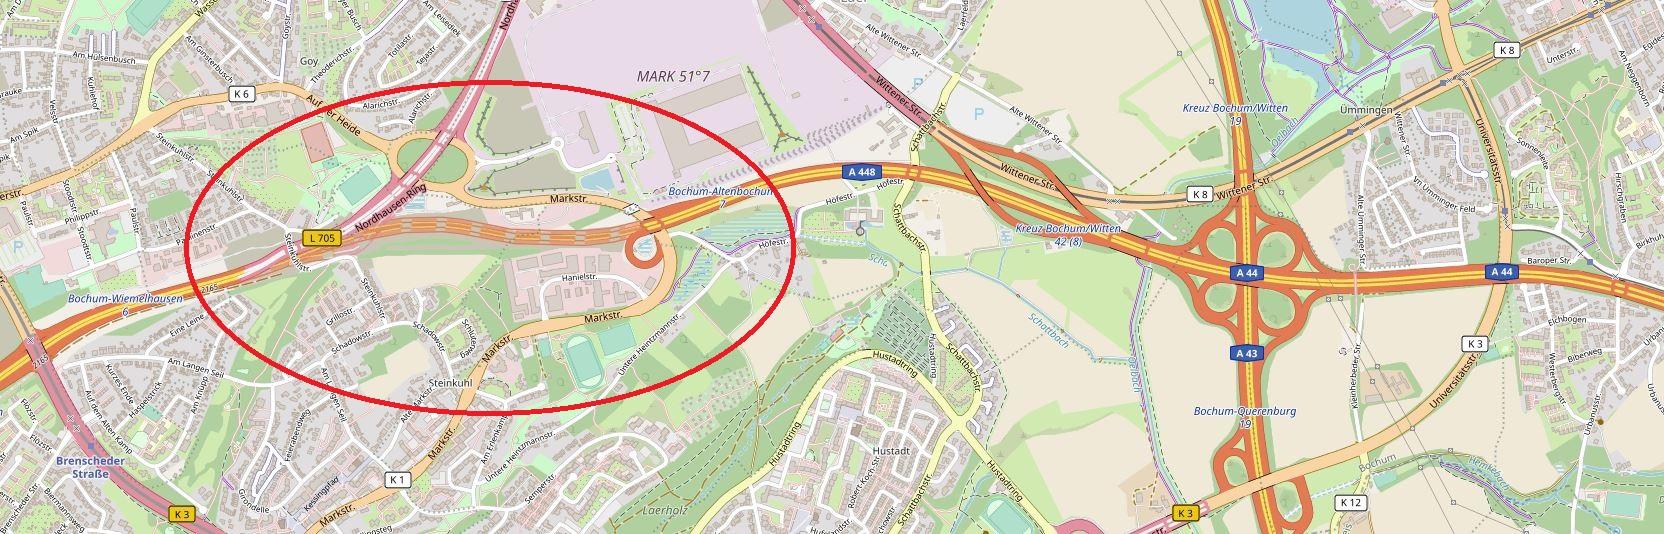 Opelspange in Bochum